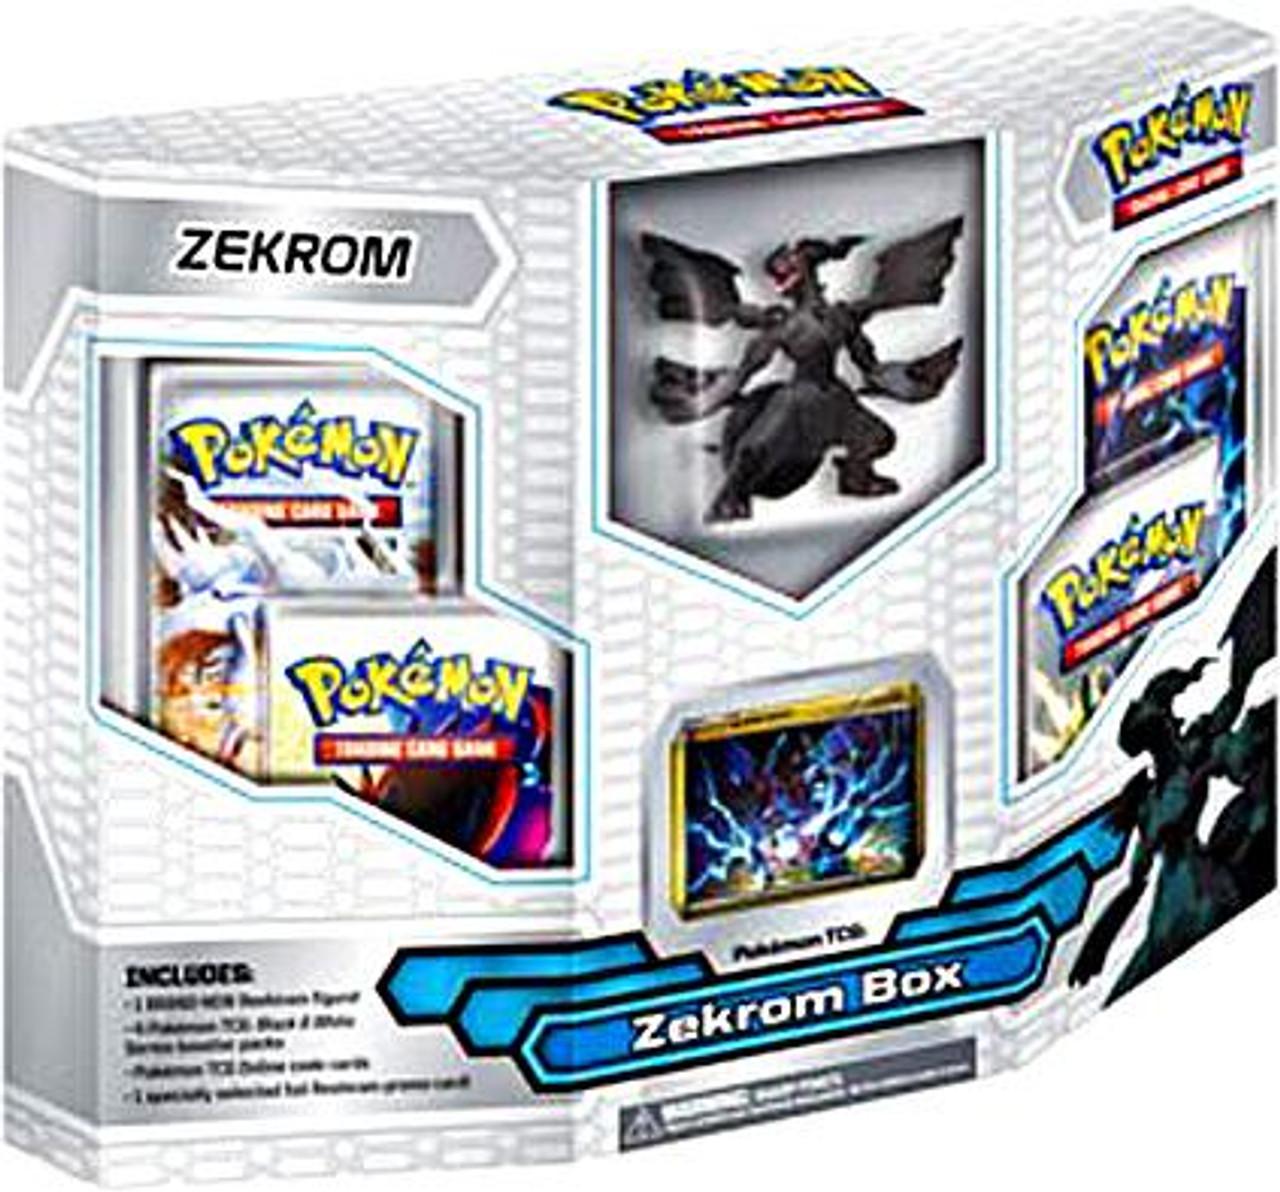 Pokemon Black & White Emerging Powers Zekrom Box